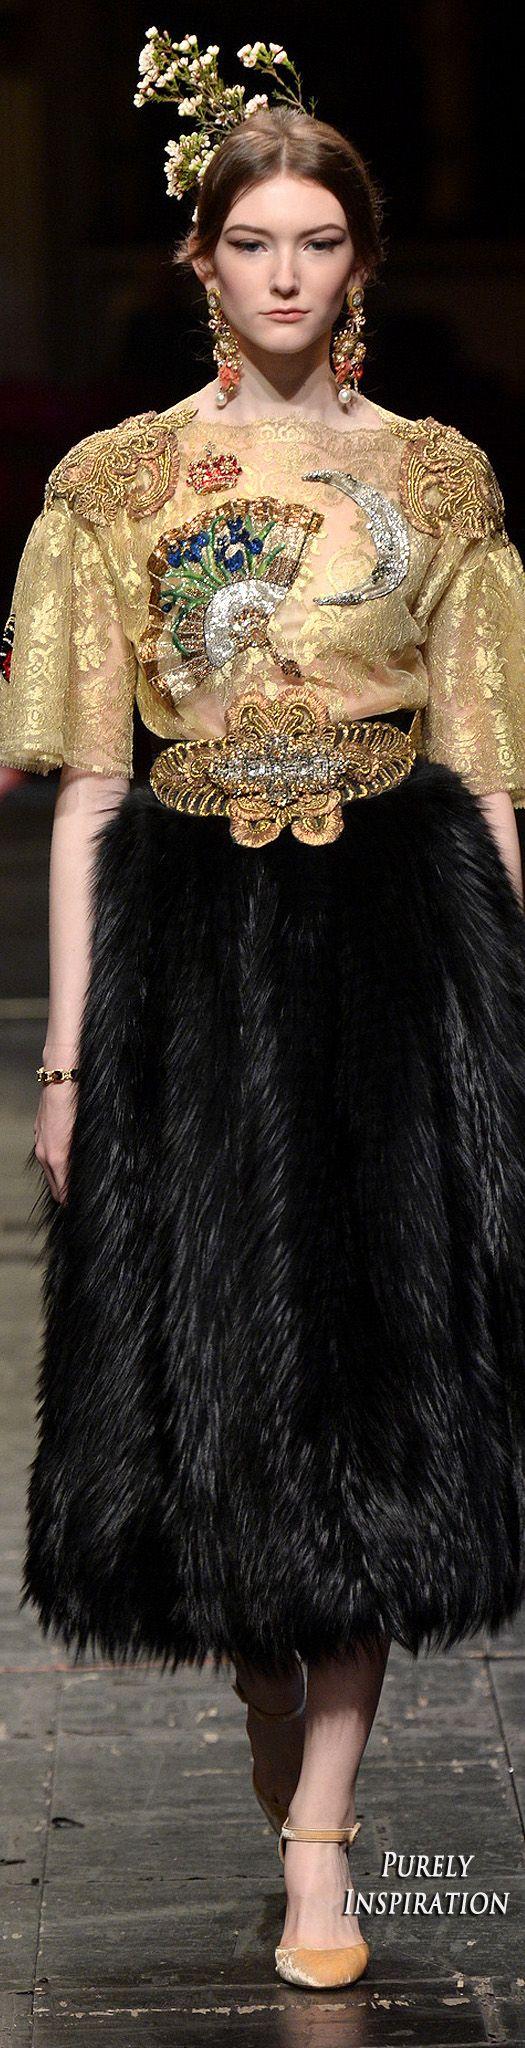 Dolce & Gabbana 2016 Alta Moda Collection | Purely Inspiration